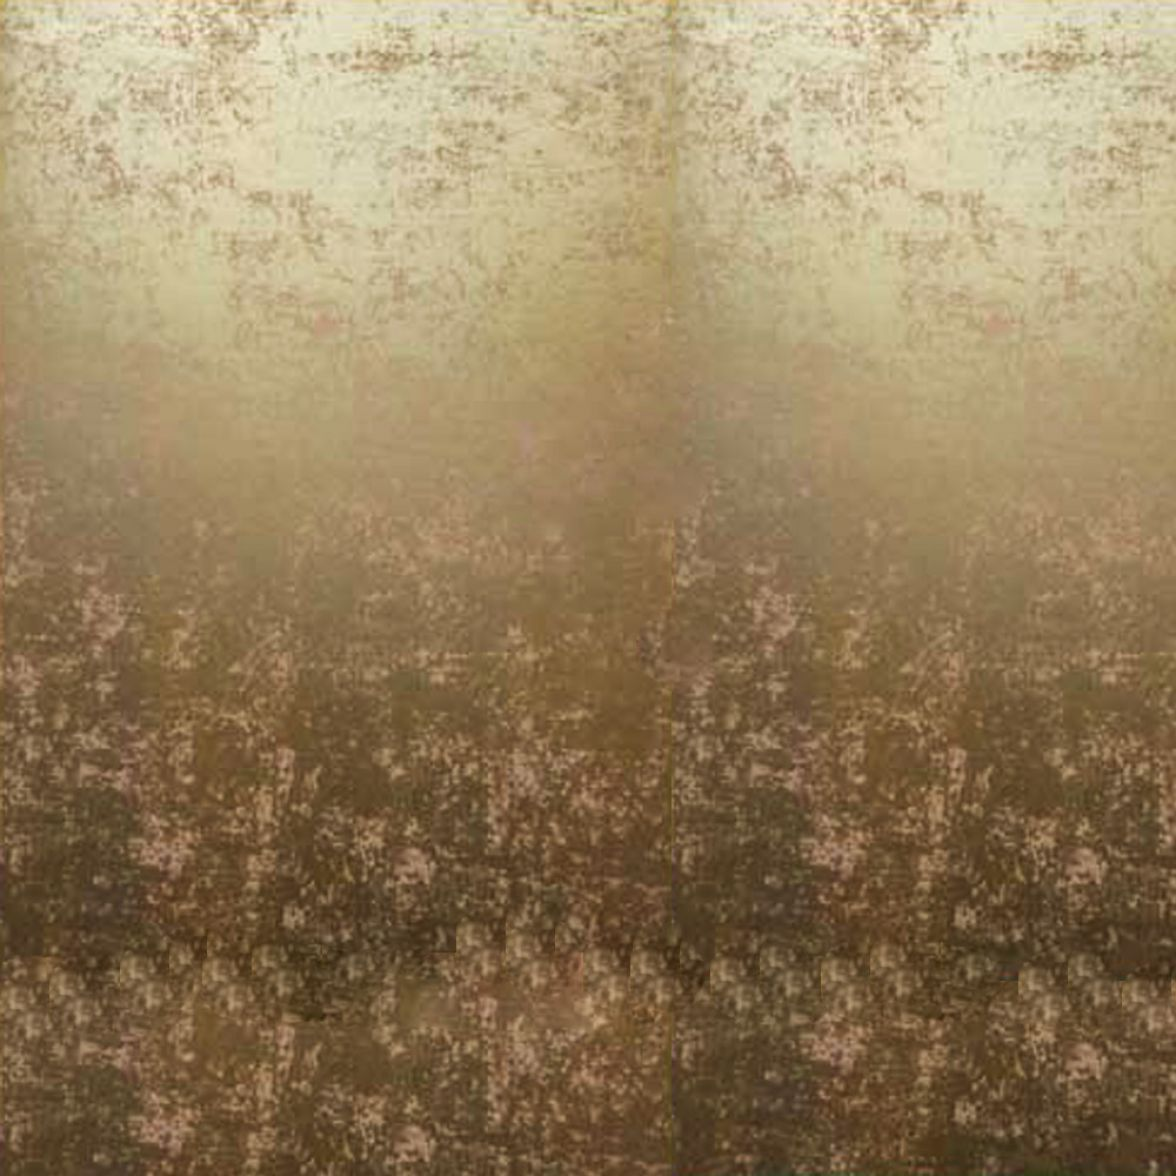 Murs Antiens Wallpapers